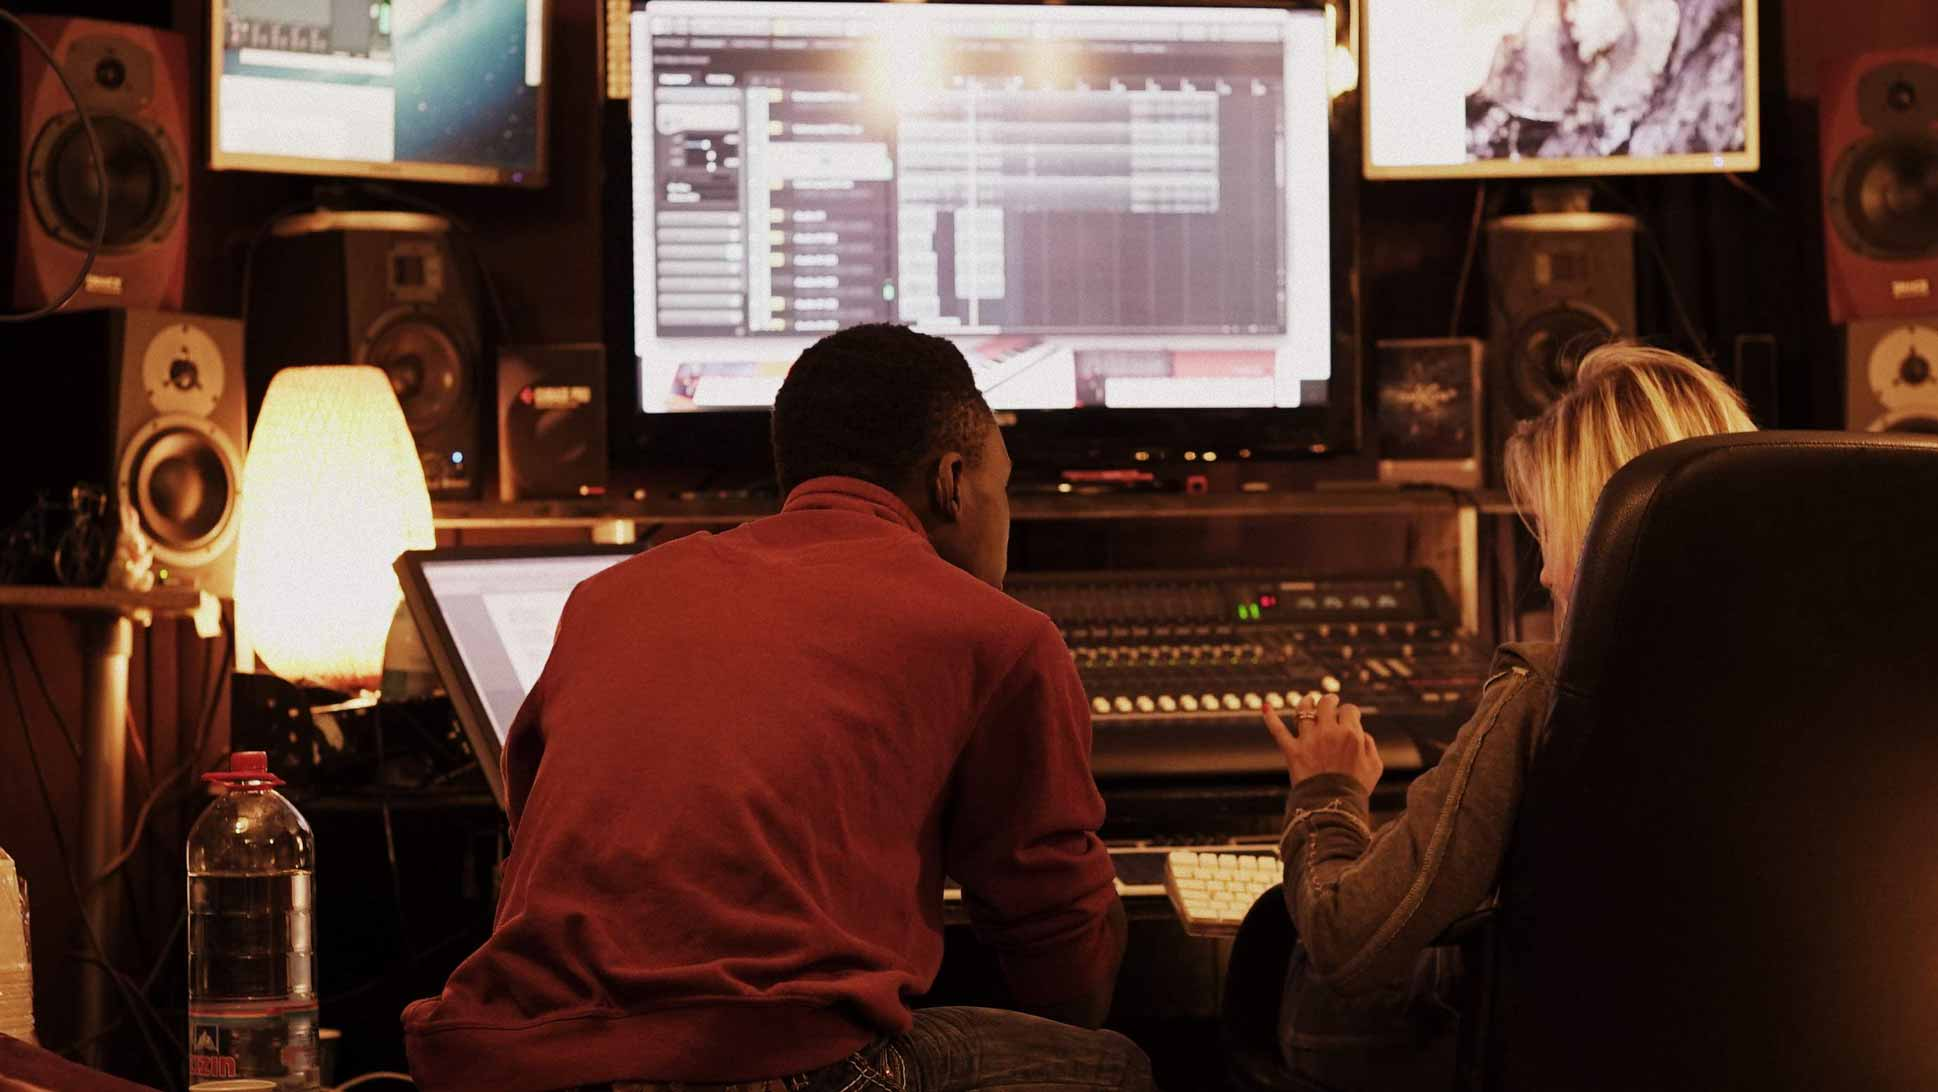 Studio de inregistrari audio productie muzicala mix master compozitor producator beatmaker cover